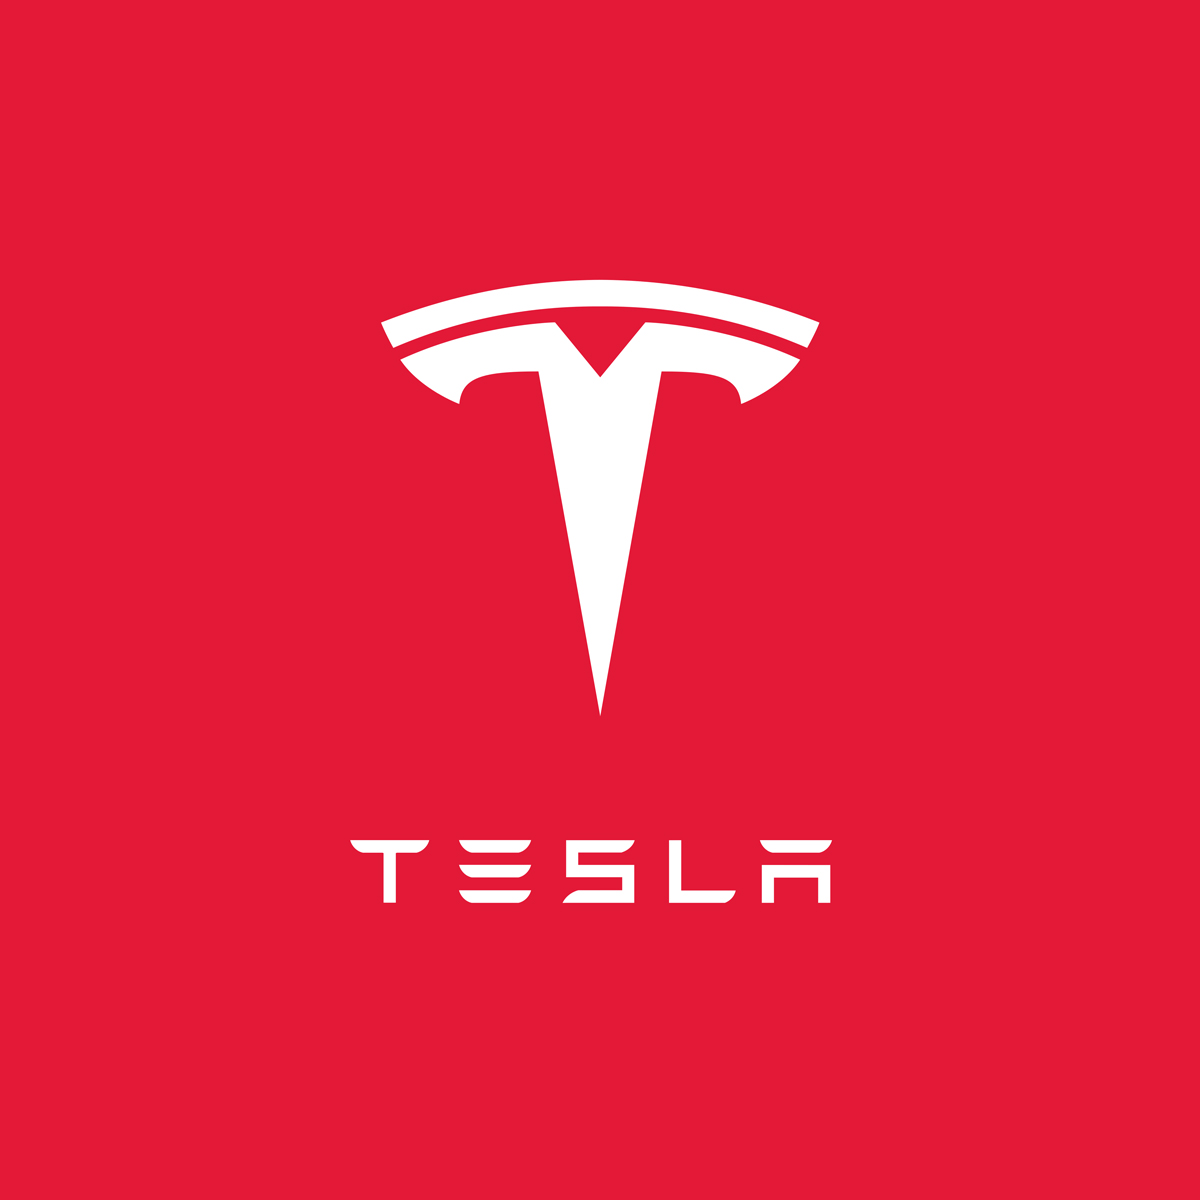 Case Study — Tesla (Coming Soon)